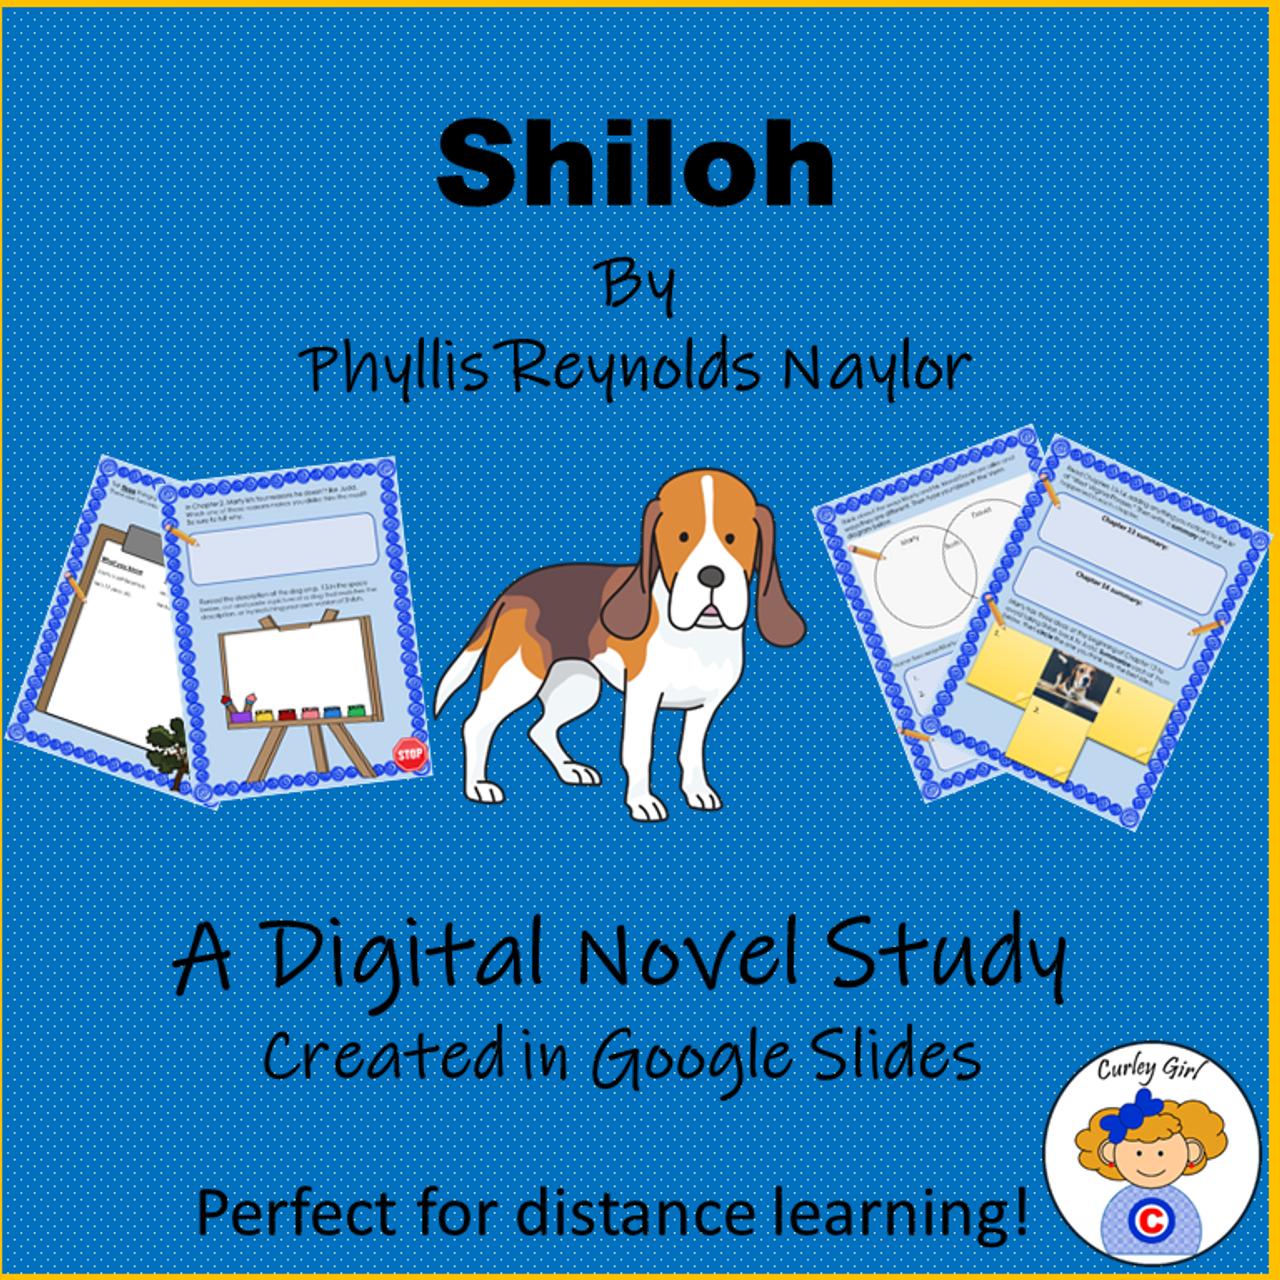 Shiloh Digital Novel Study in Google Slides